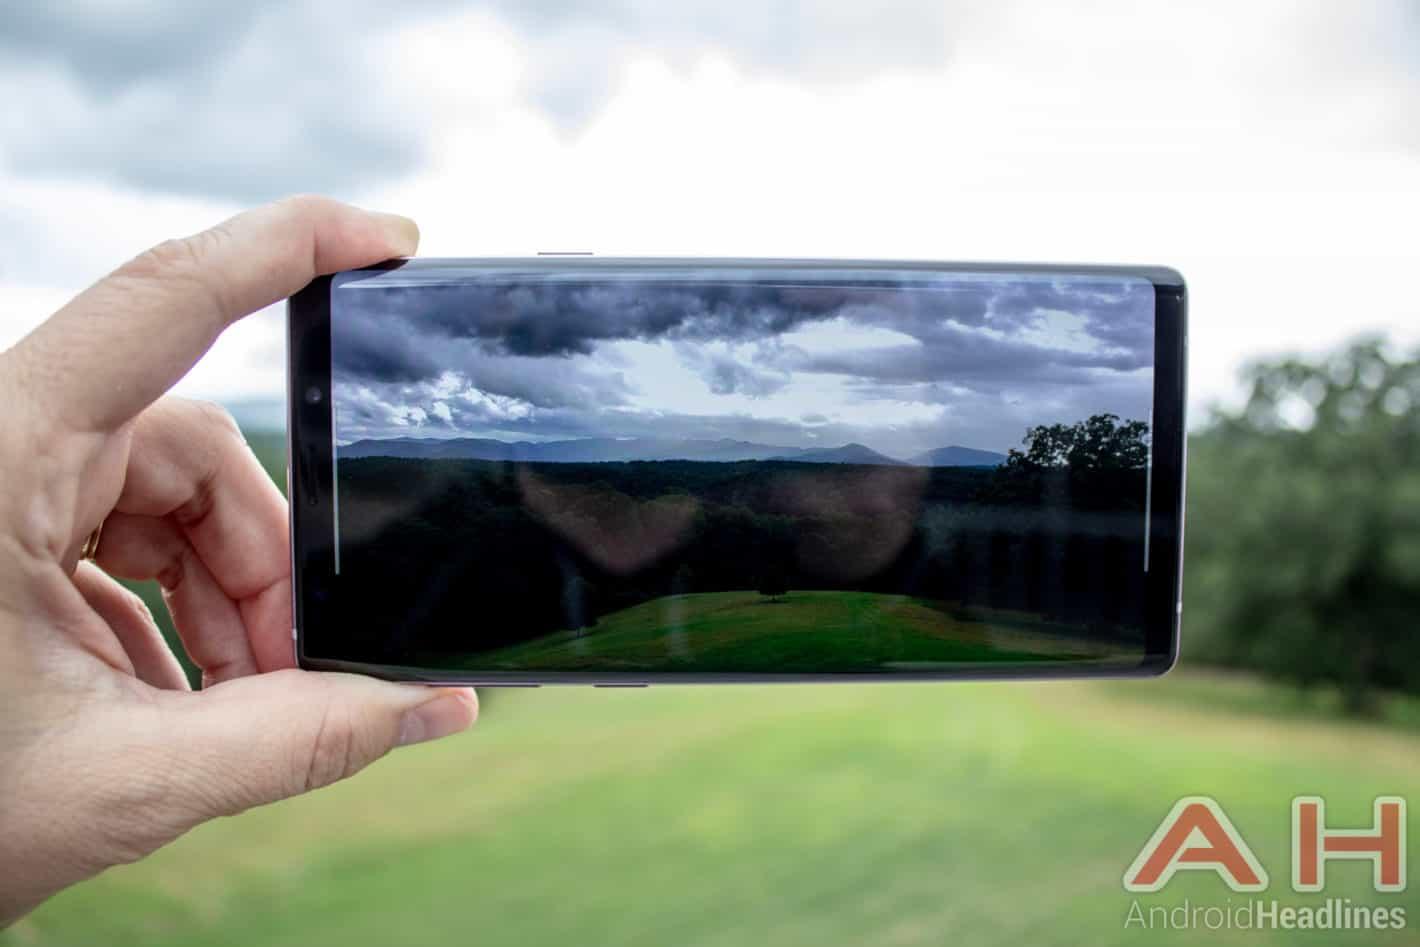 Samsung Galaxy Note 9 AH NS 05 display